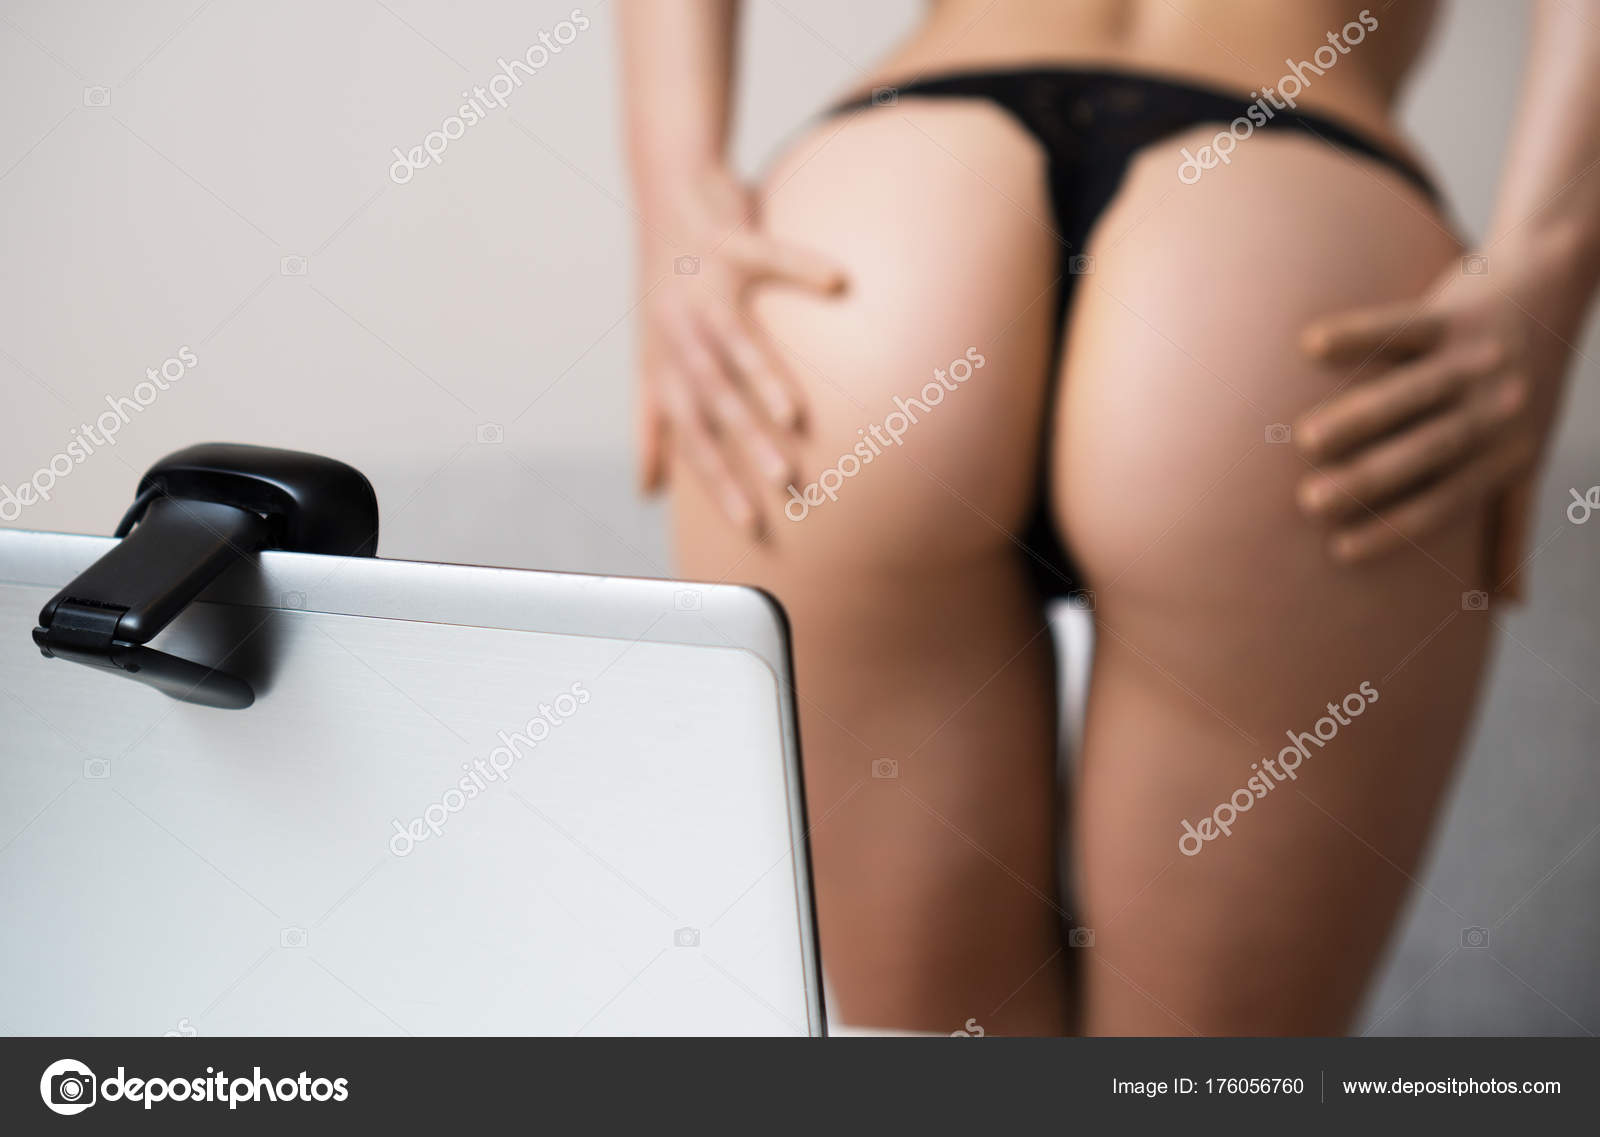 Виртуального секса dt rfvthf